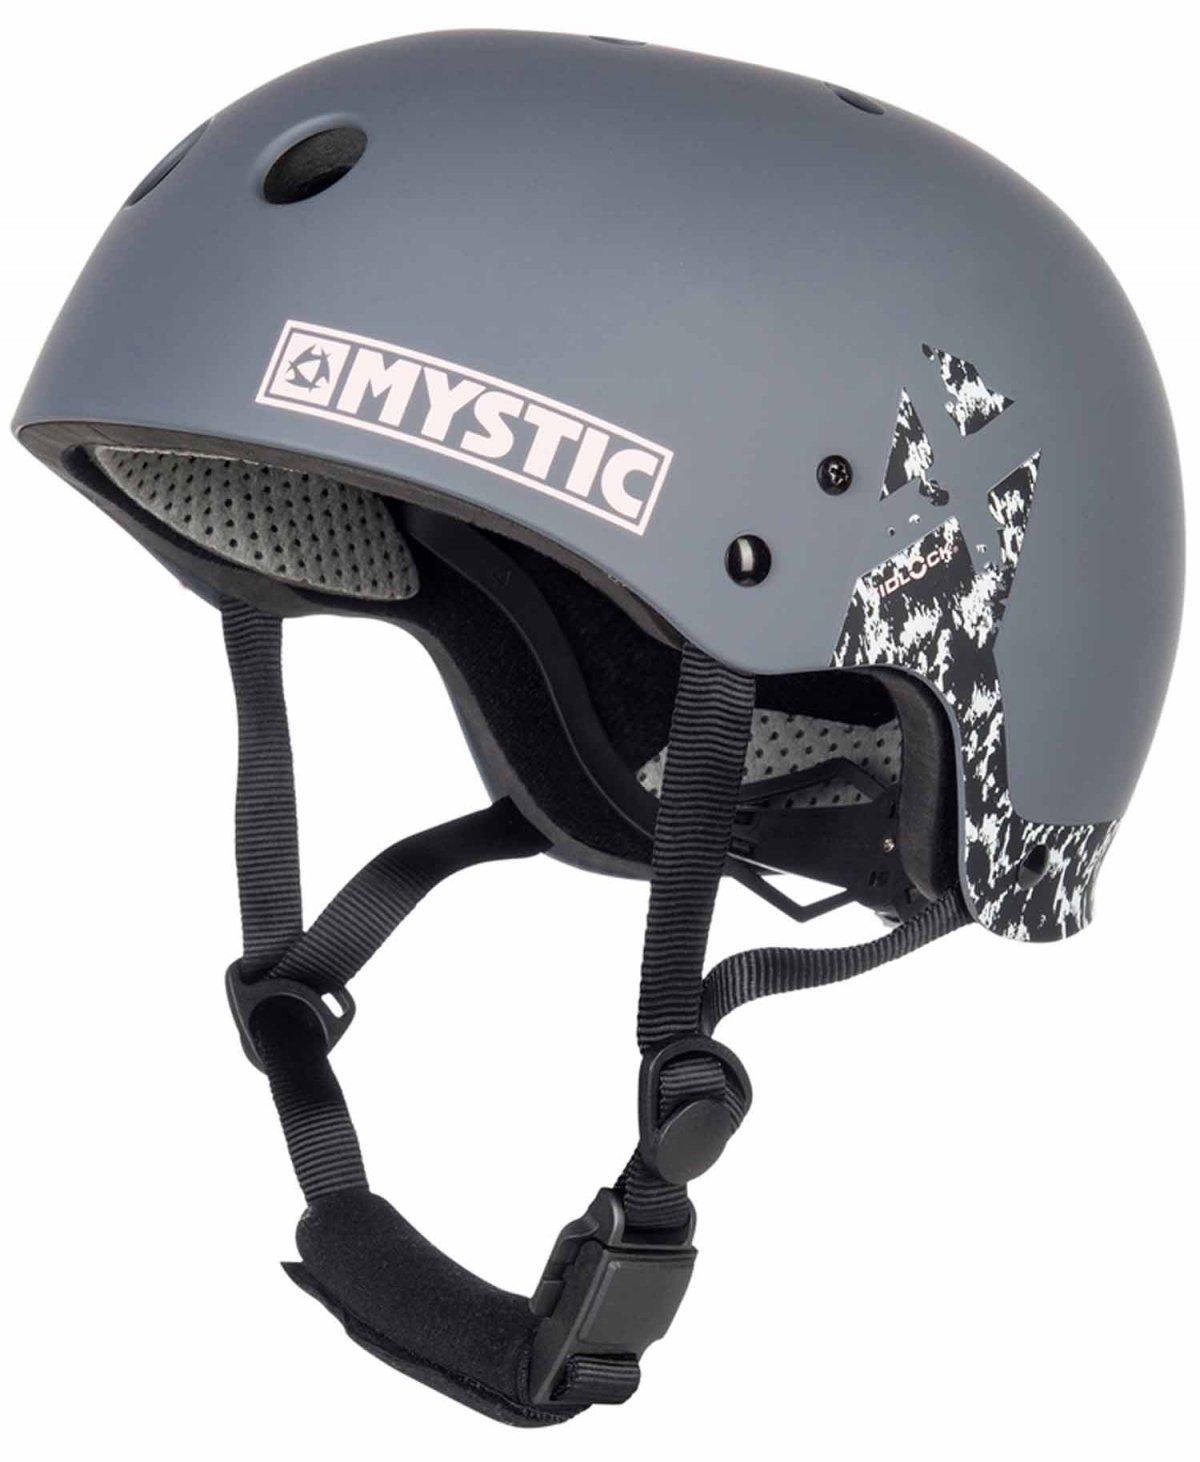 Mystic mk8 Xヘルメット2018 Mystic – – グレー B079T1VPTH B079T1VPTH Medium, 京の恵み:acc592bb --- sharoshka.org